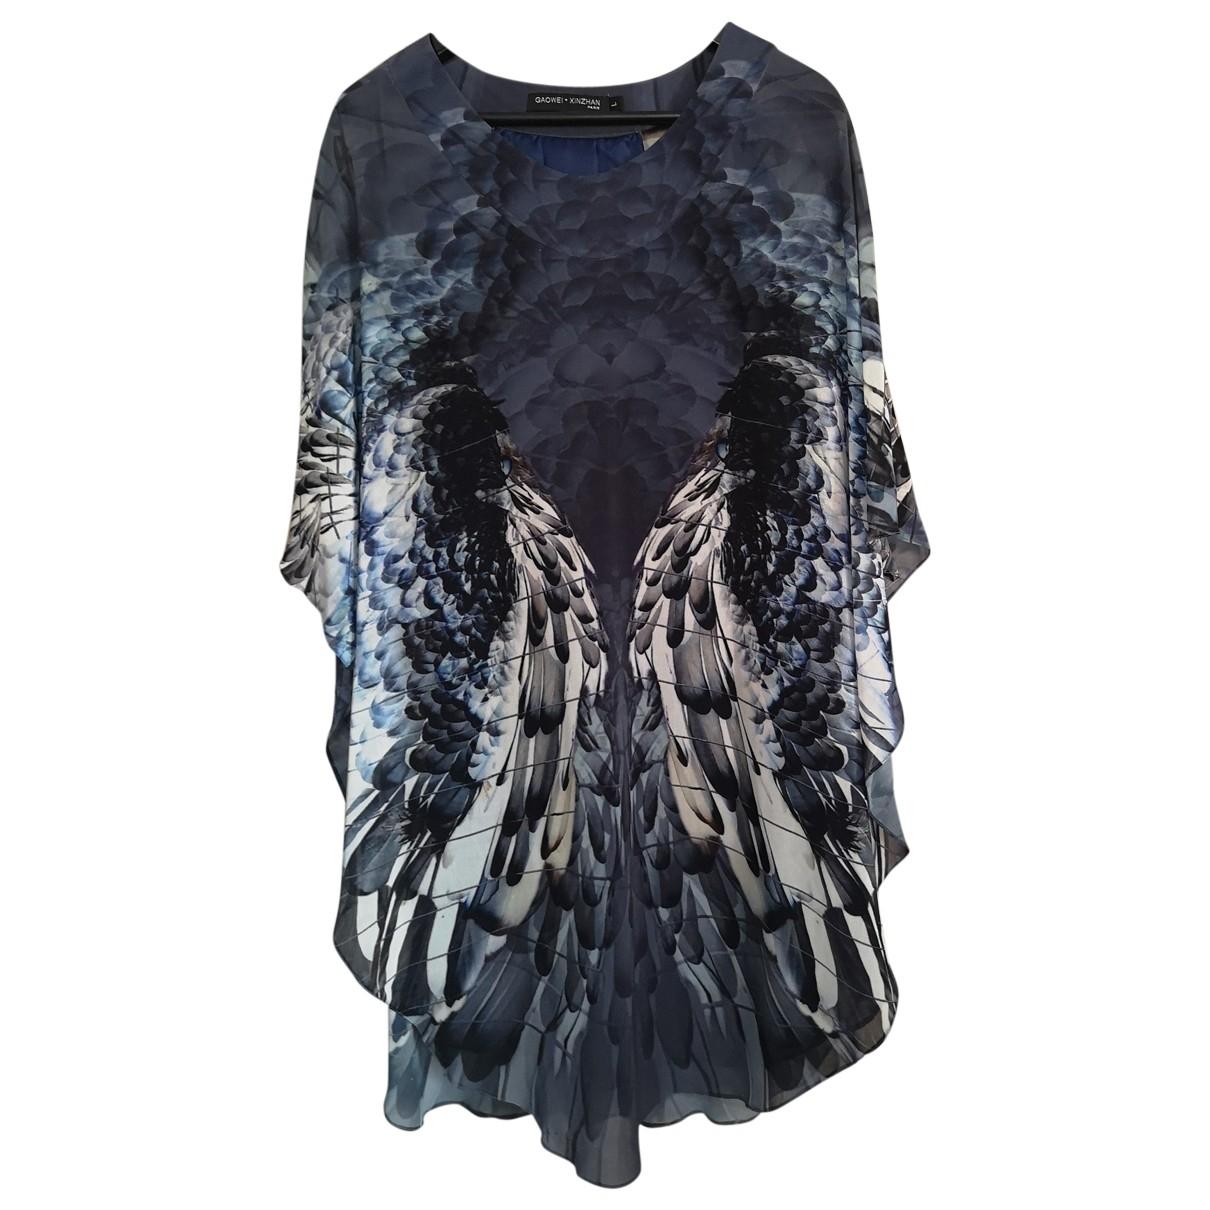 Gaowei Xianzhan \N Kleid in  Blau Synthetik